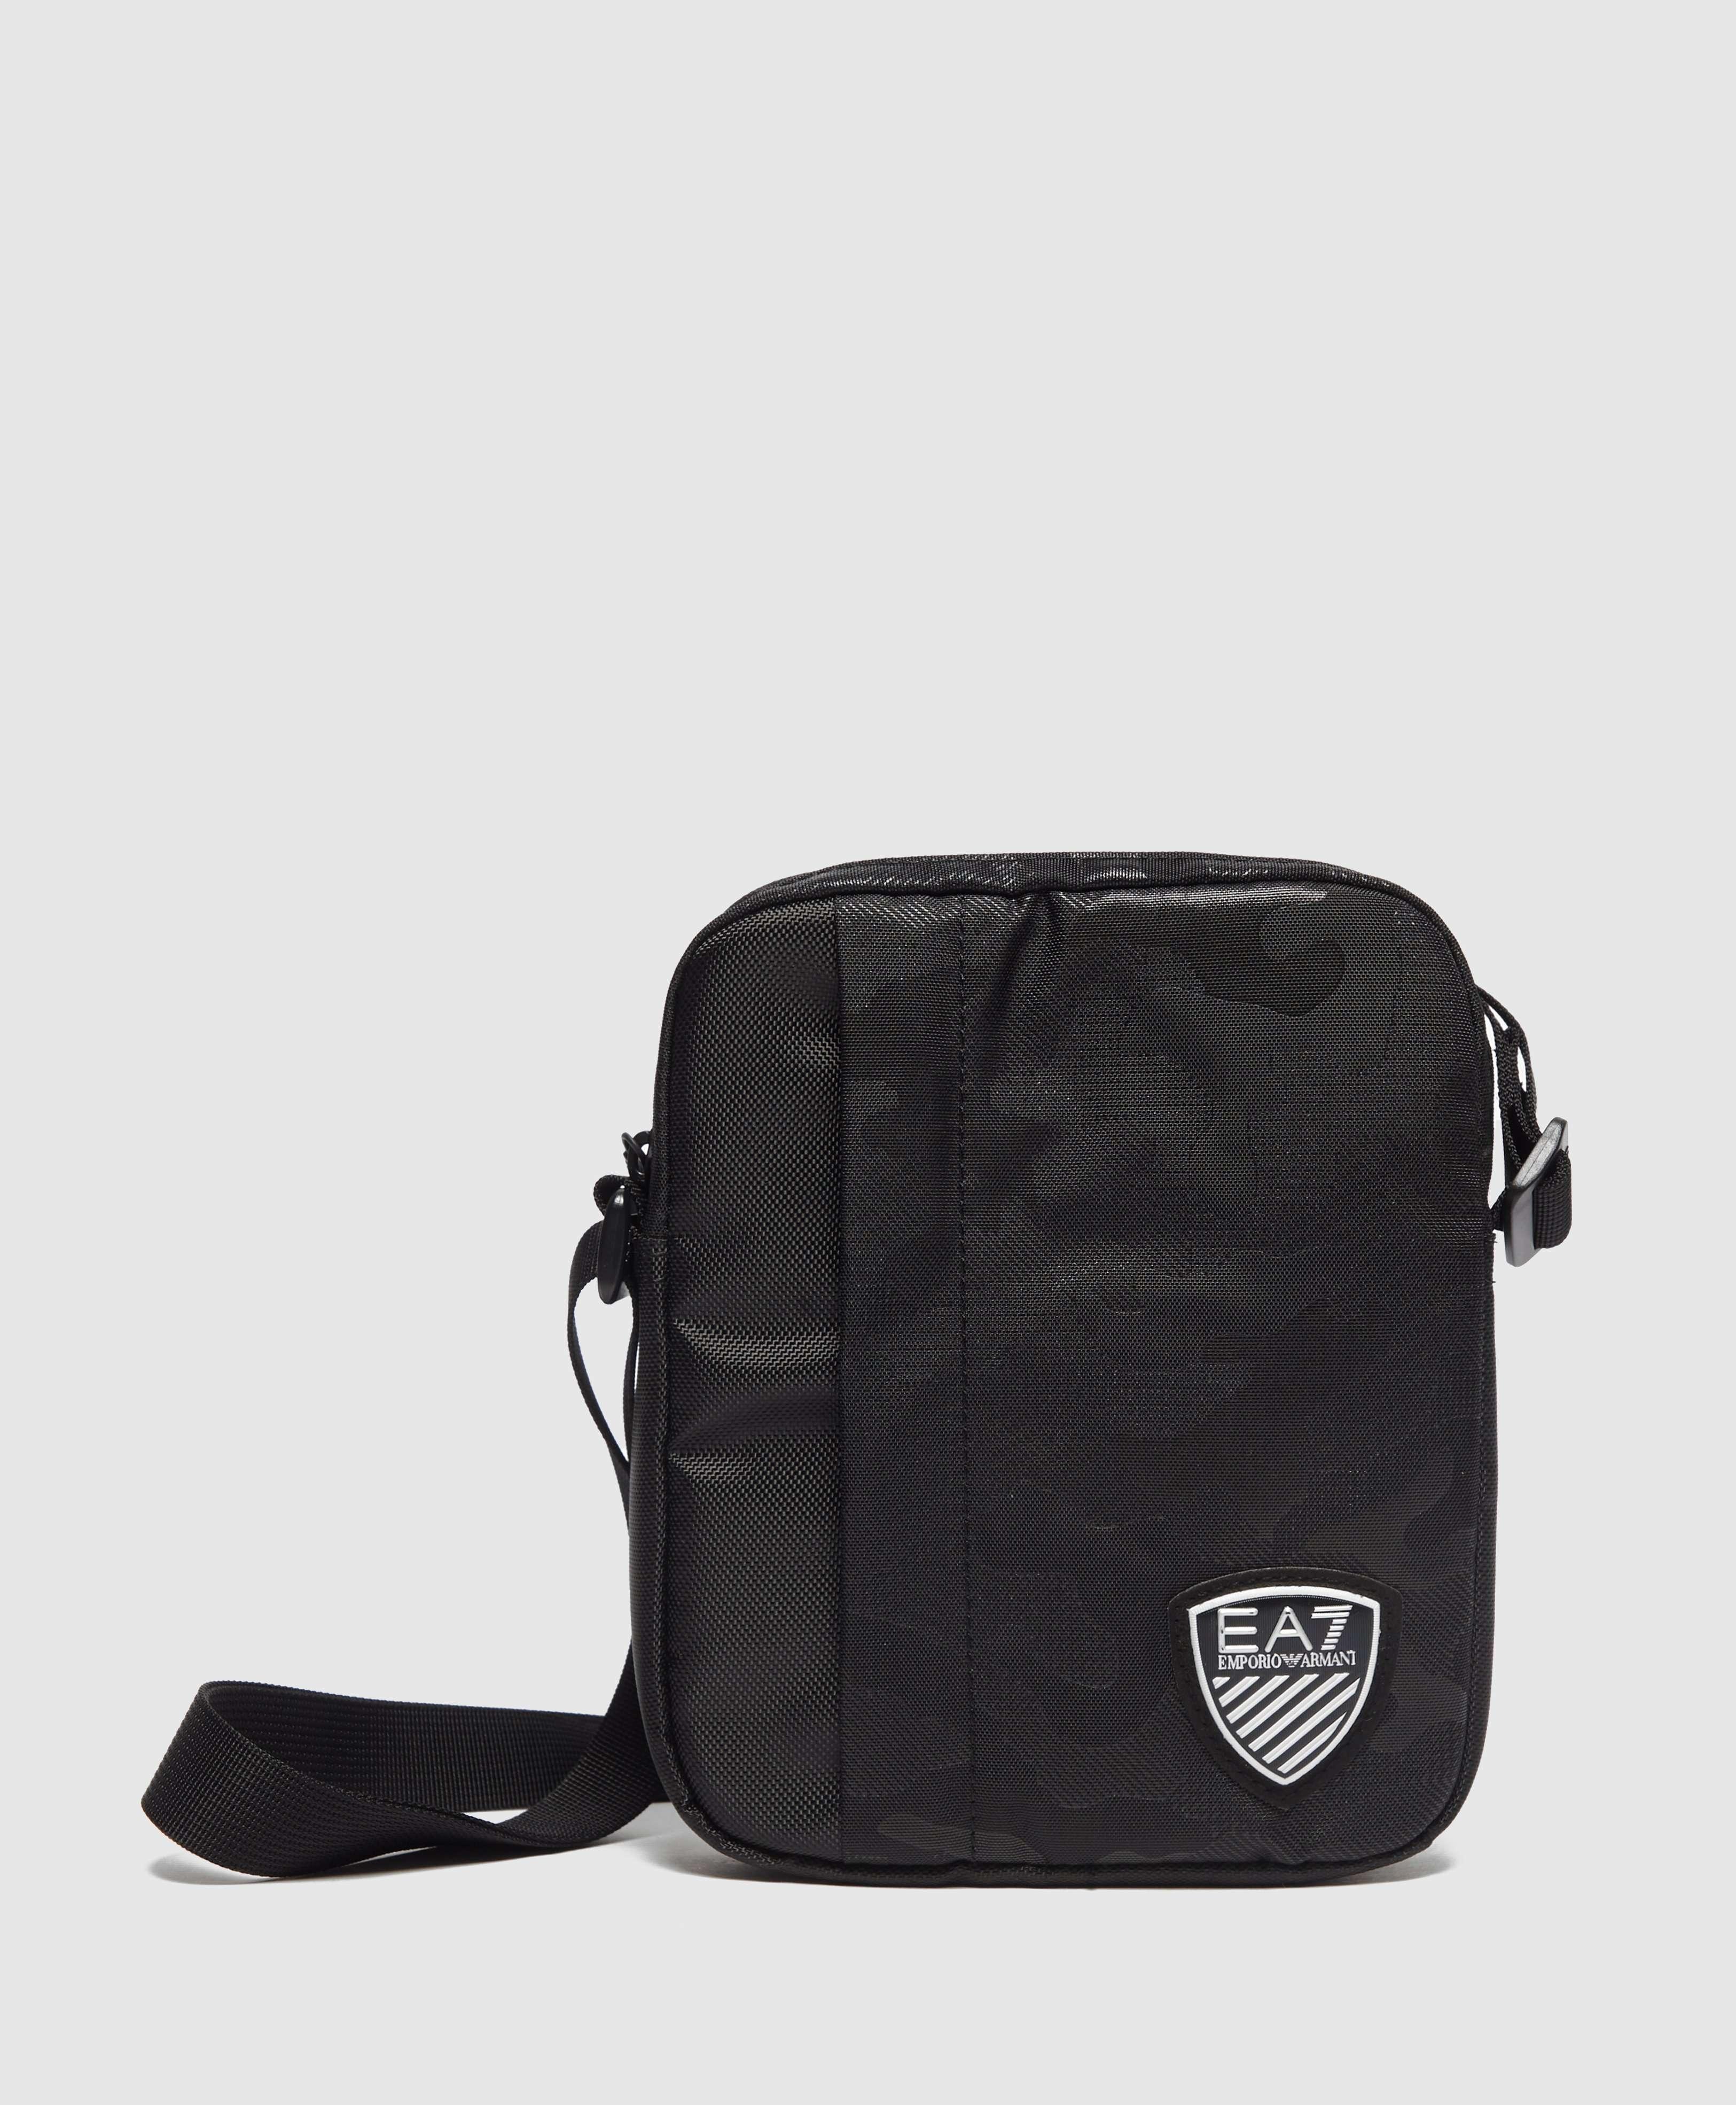 Emporio Armani EA7 Soccer Small Item Bag